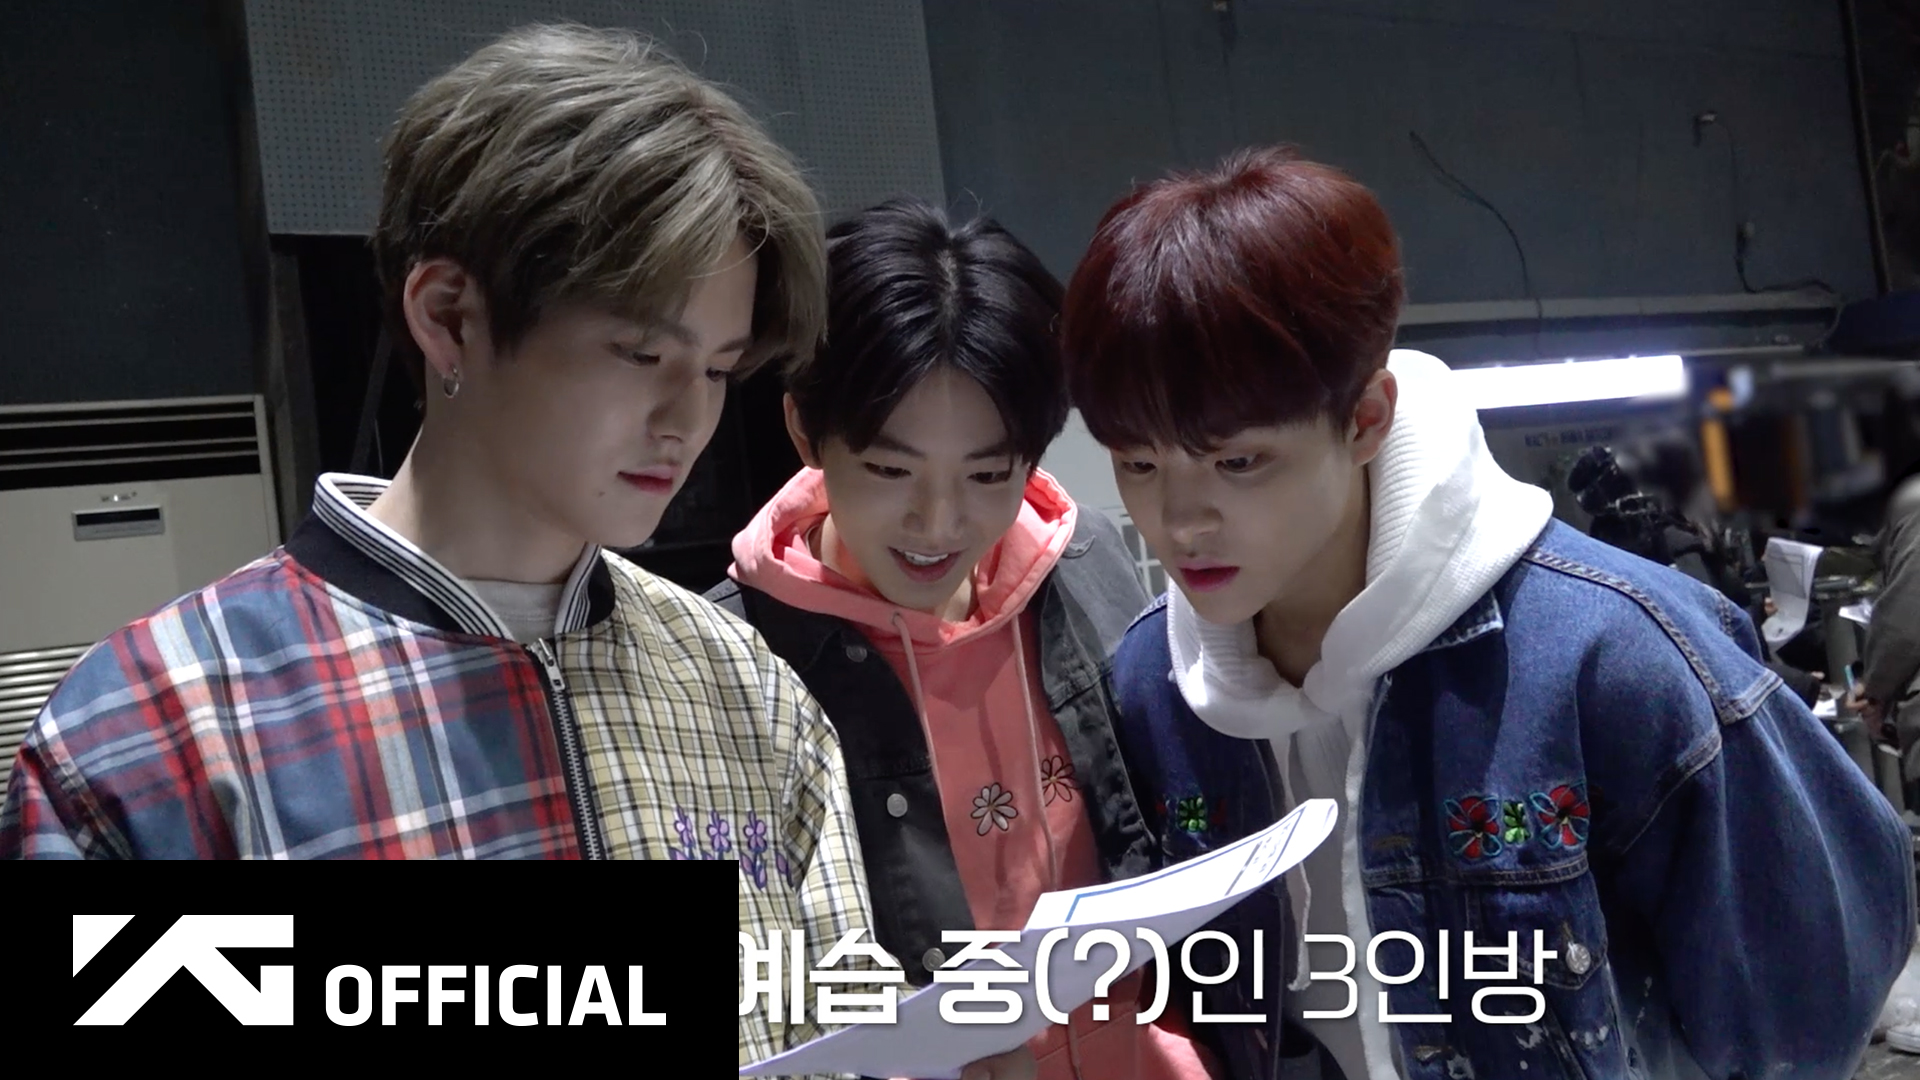 (Korea) '컴백' 트레저, 자체 제작 리얼리티 시즌2 개봉박두 '22일 최초 공개'